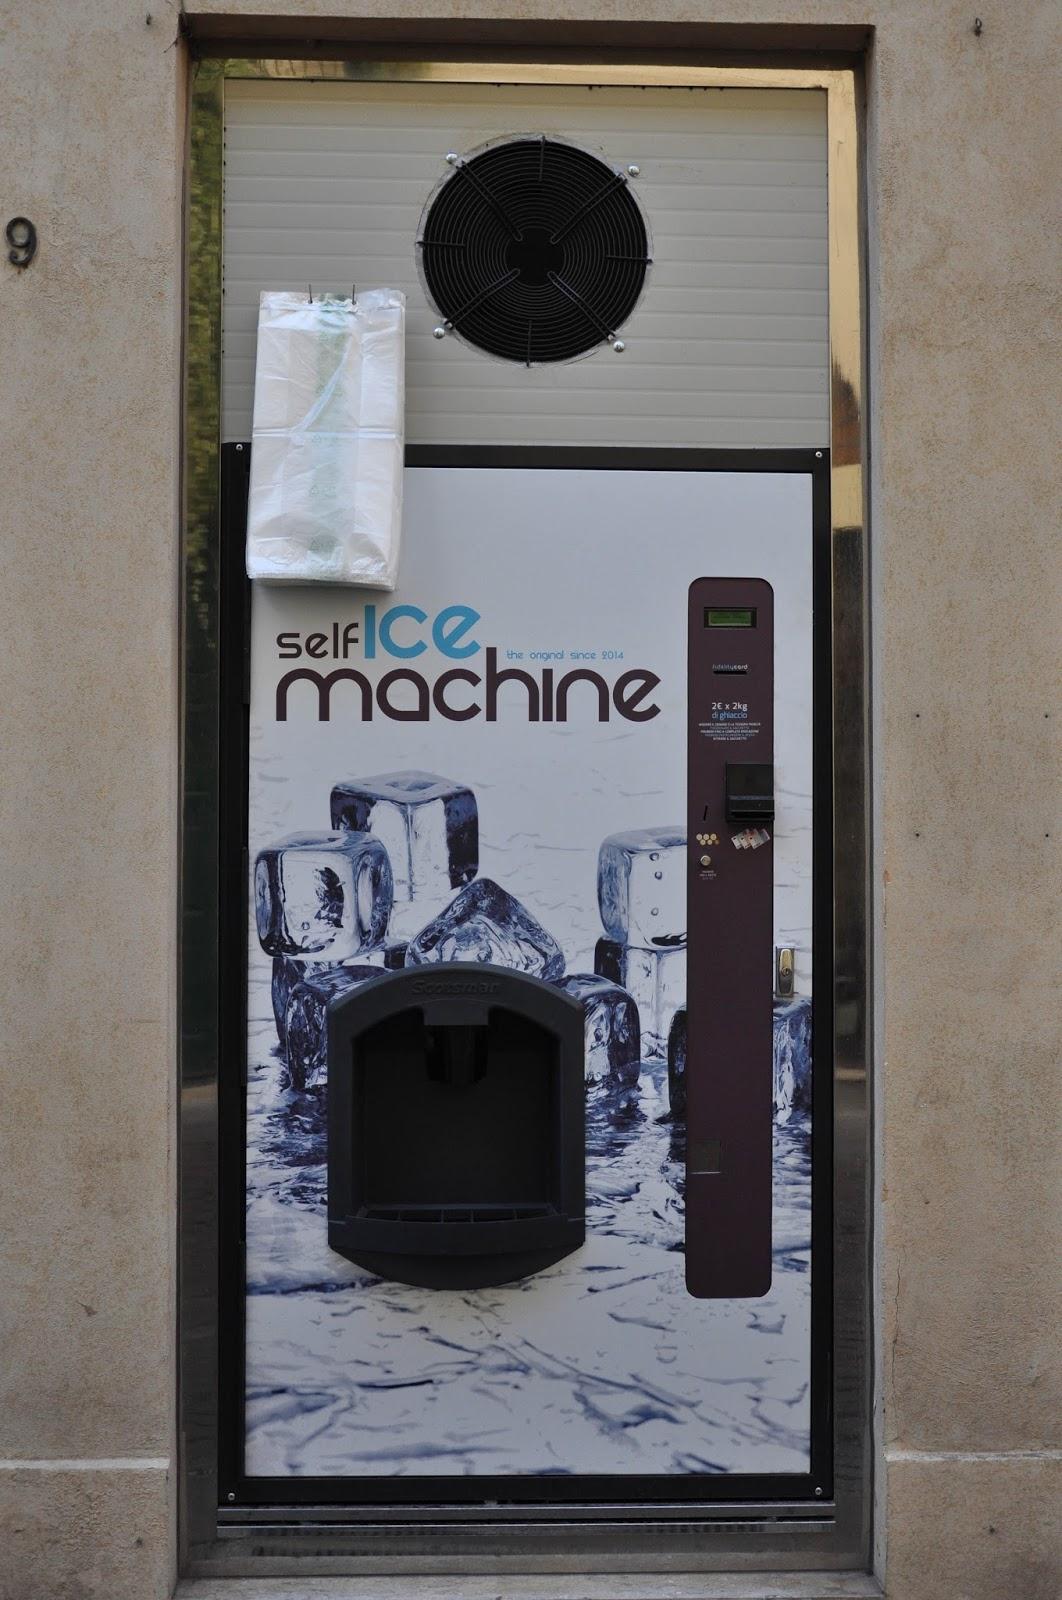 Ice-vending machine, Vicenza, Veneto, Italy